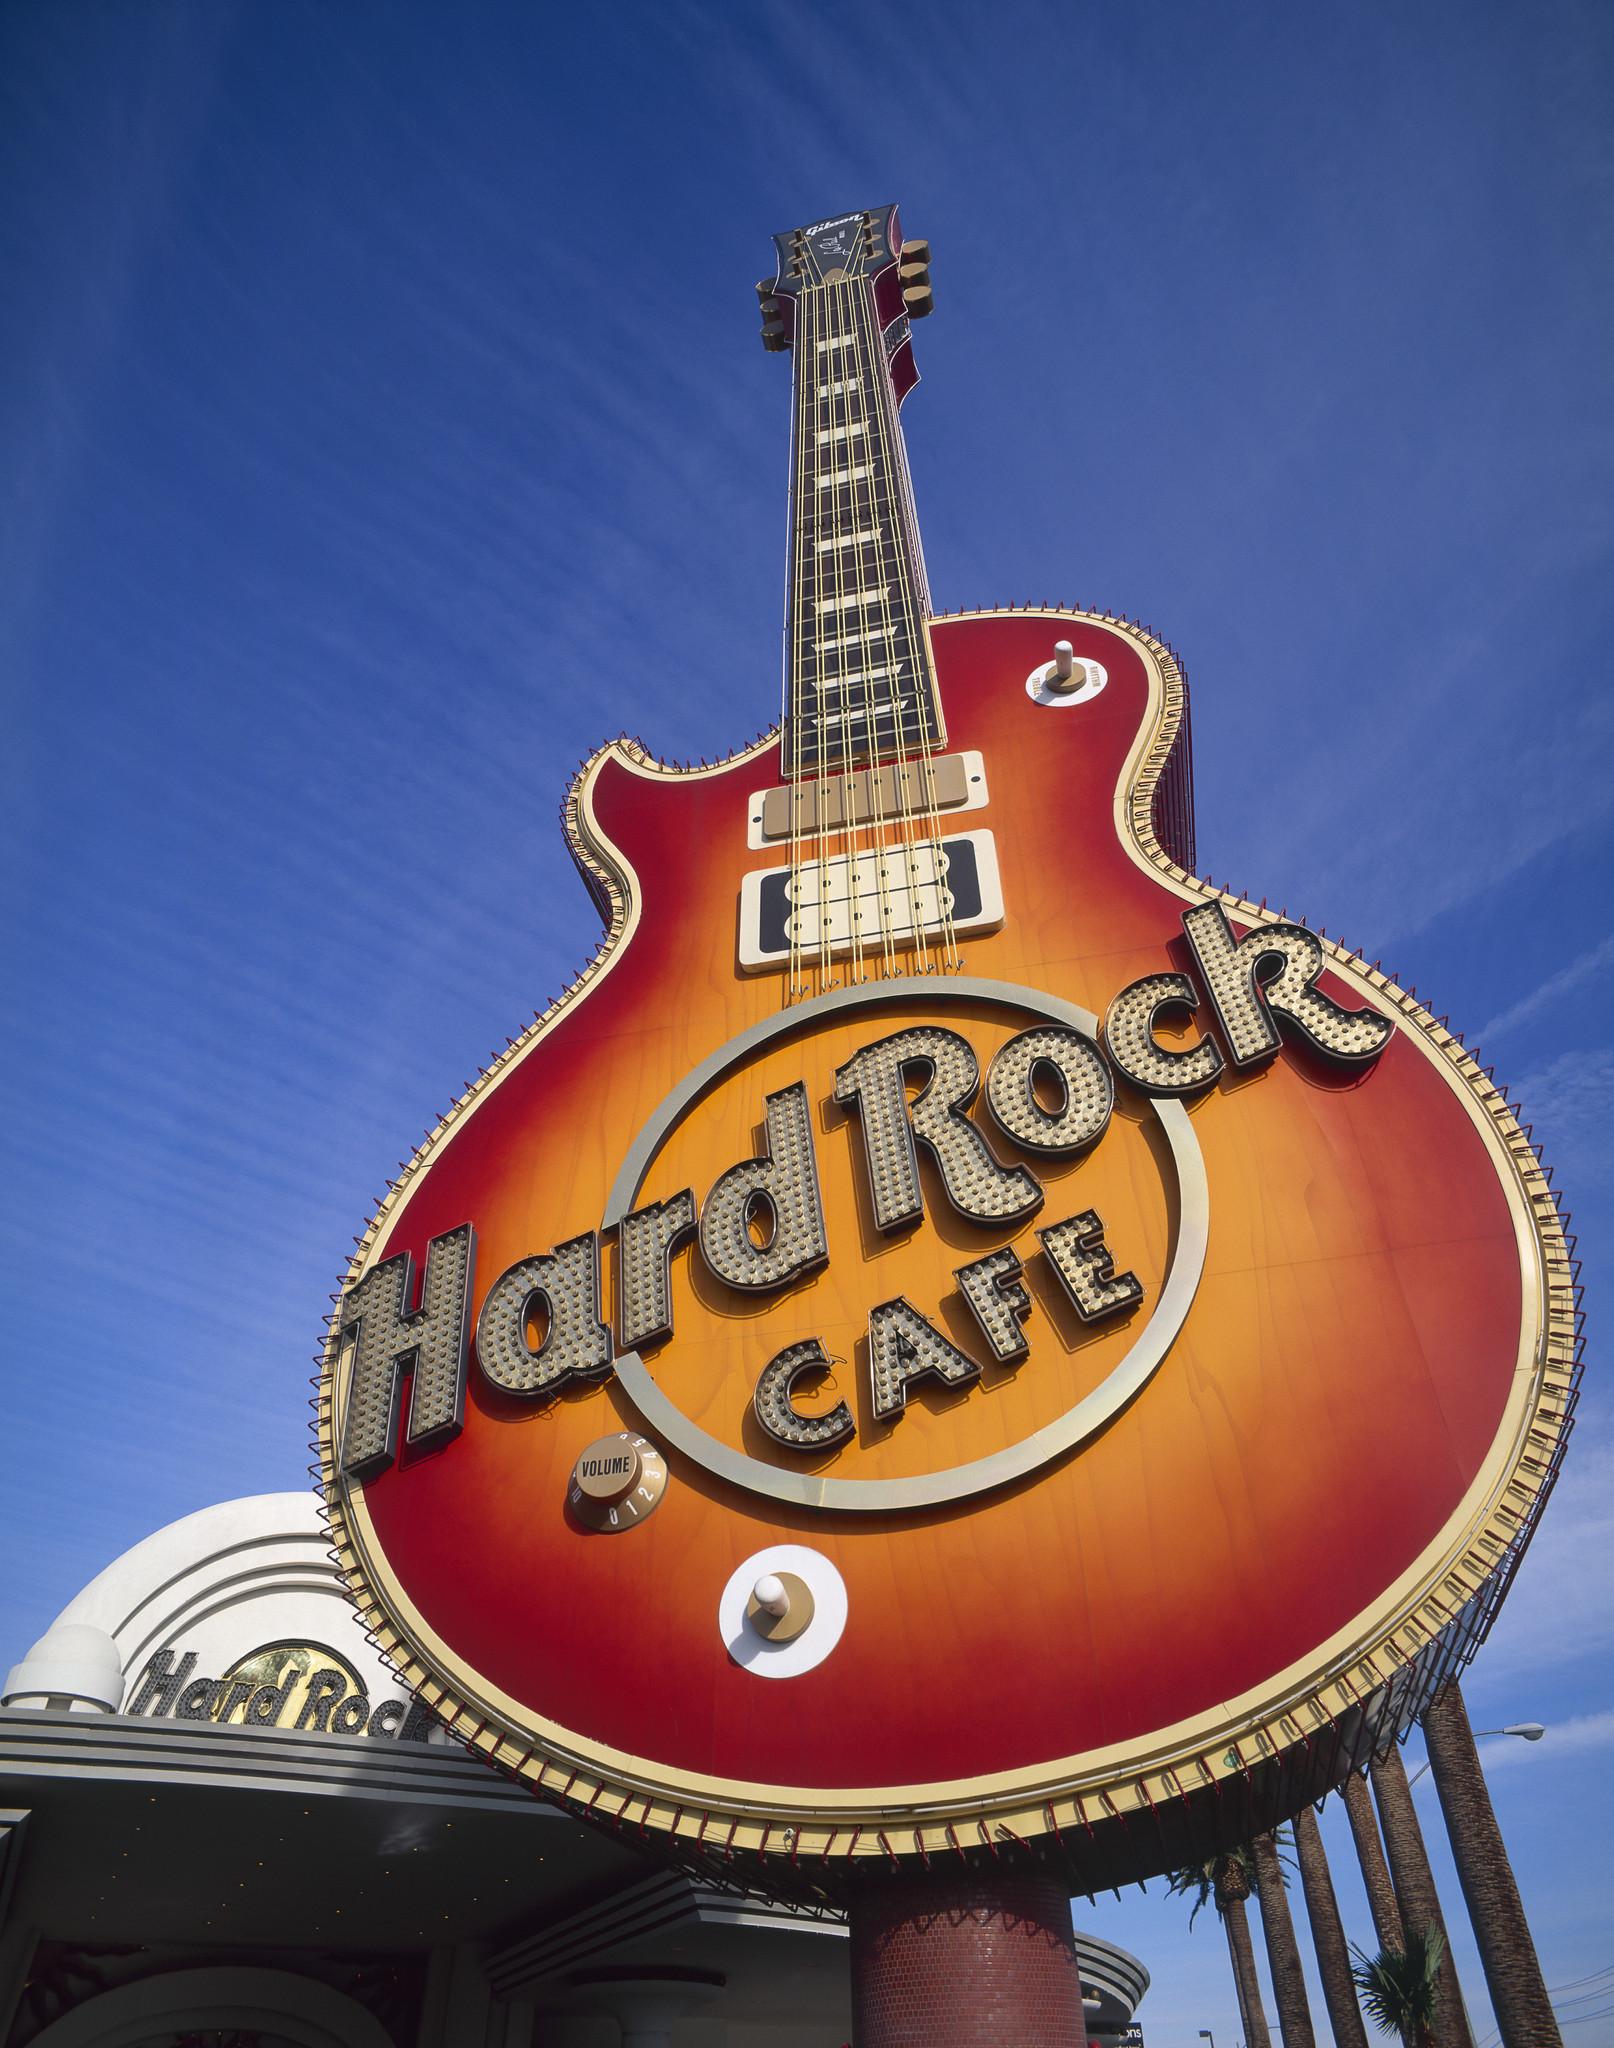 Hard Rock Caf 233 Gets Ok For Atlantic City Casino The